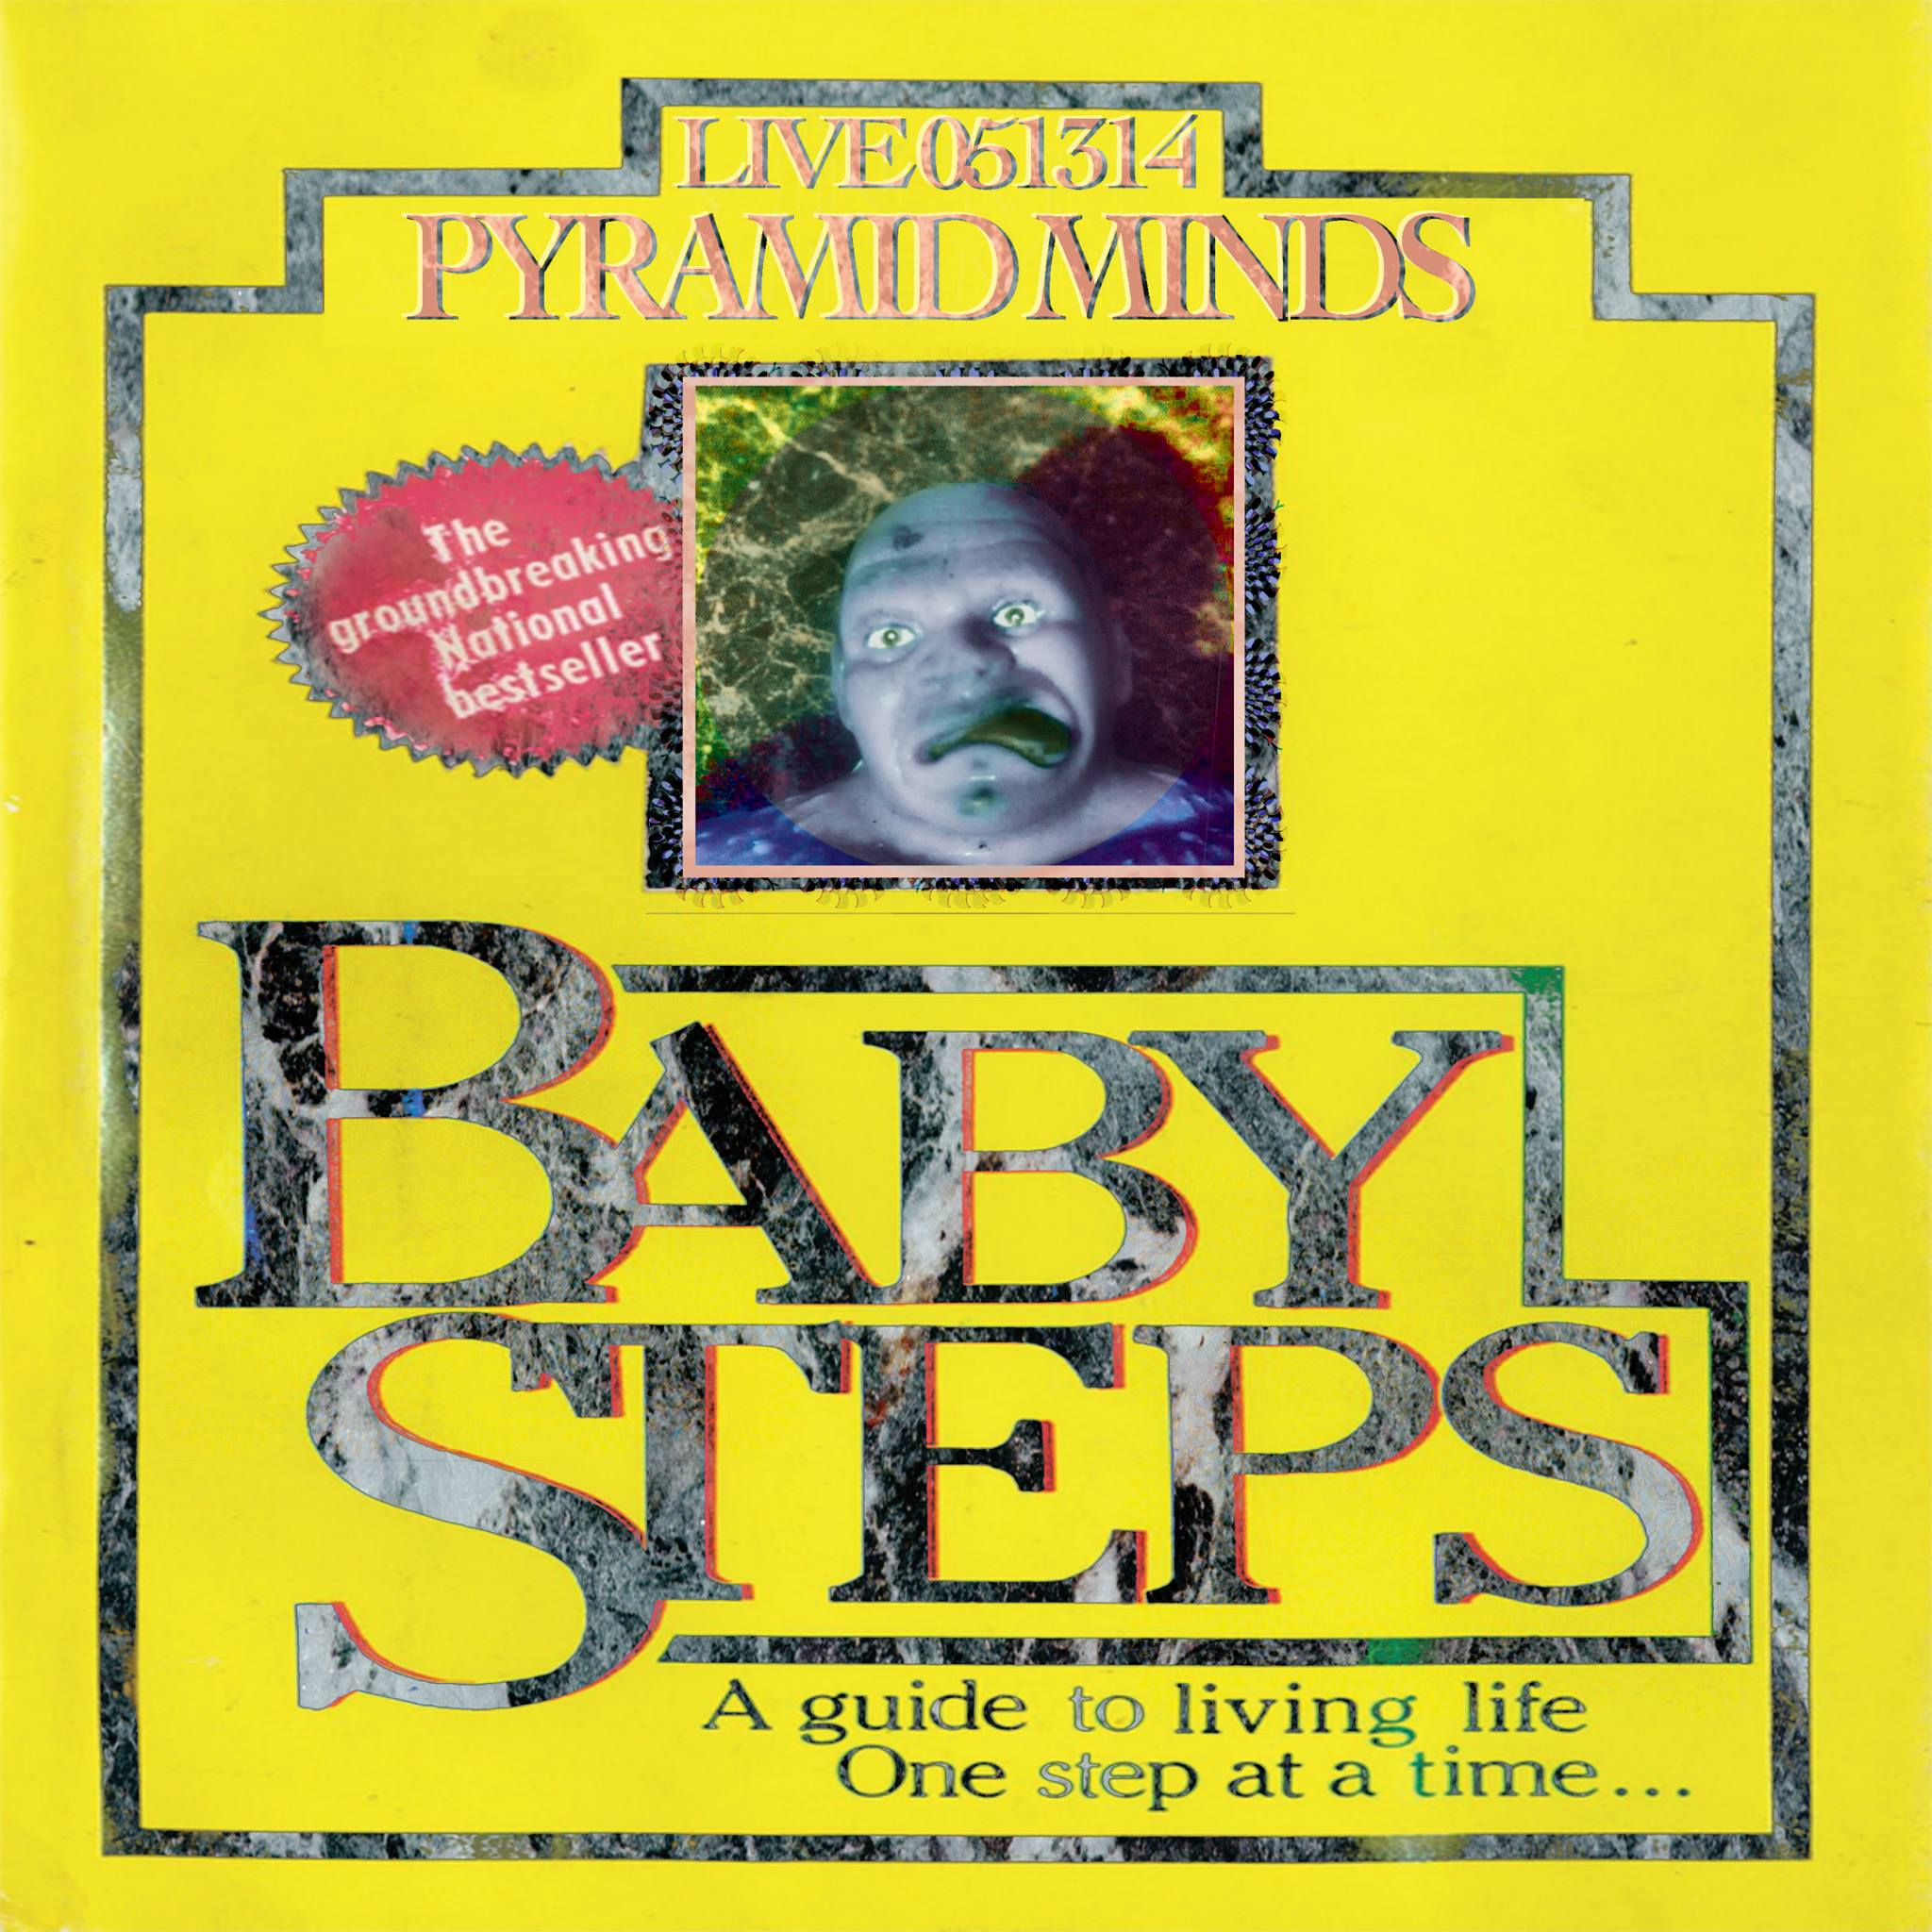 PyramidMinds_BabySteps_EP.jpg